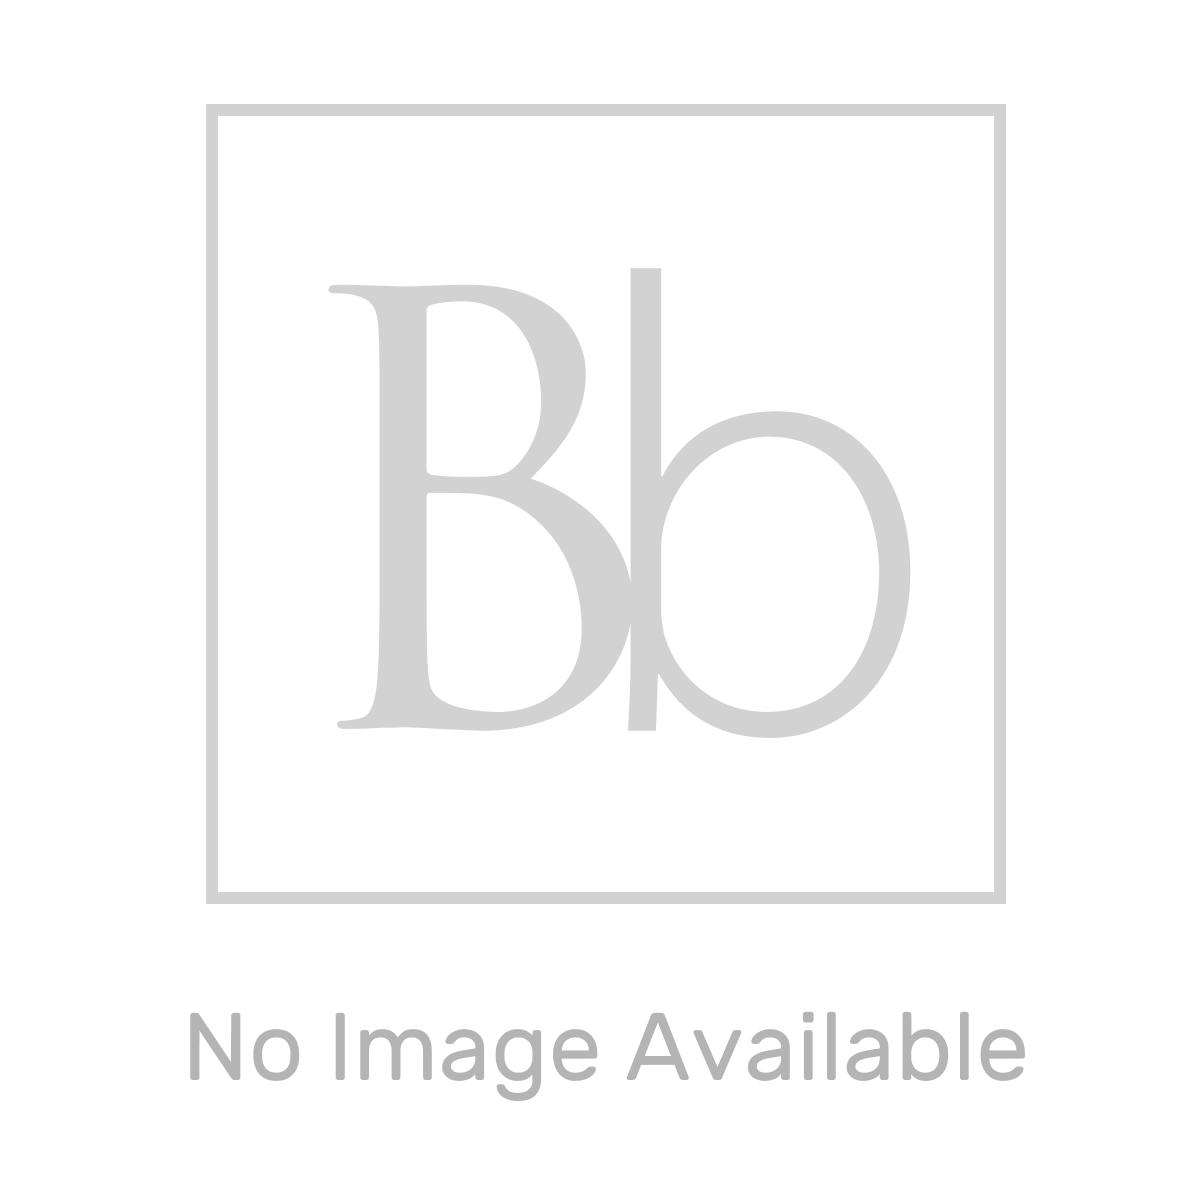 Aquadart White Slate Shower Tray 1200 x 900